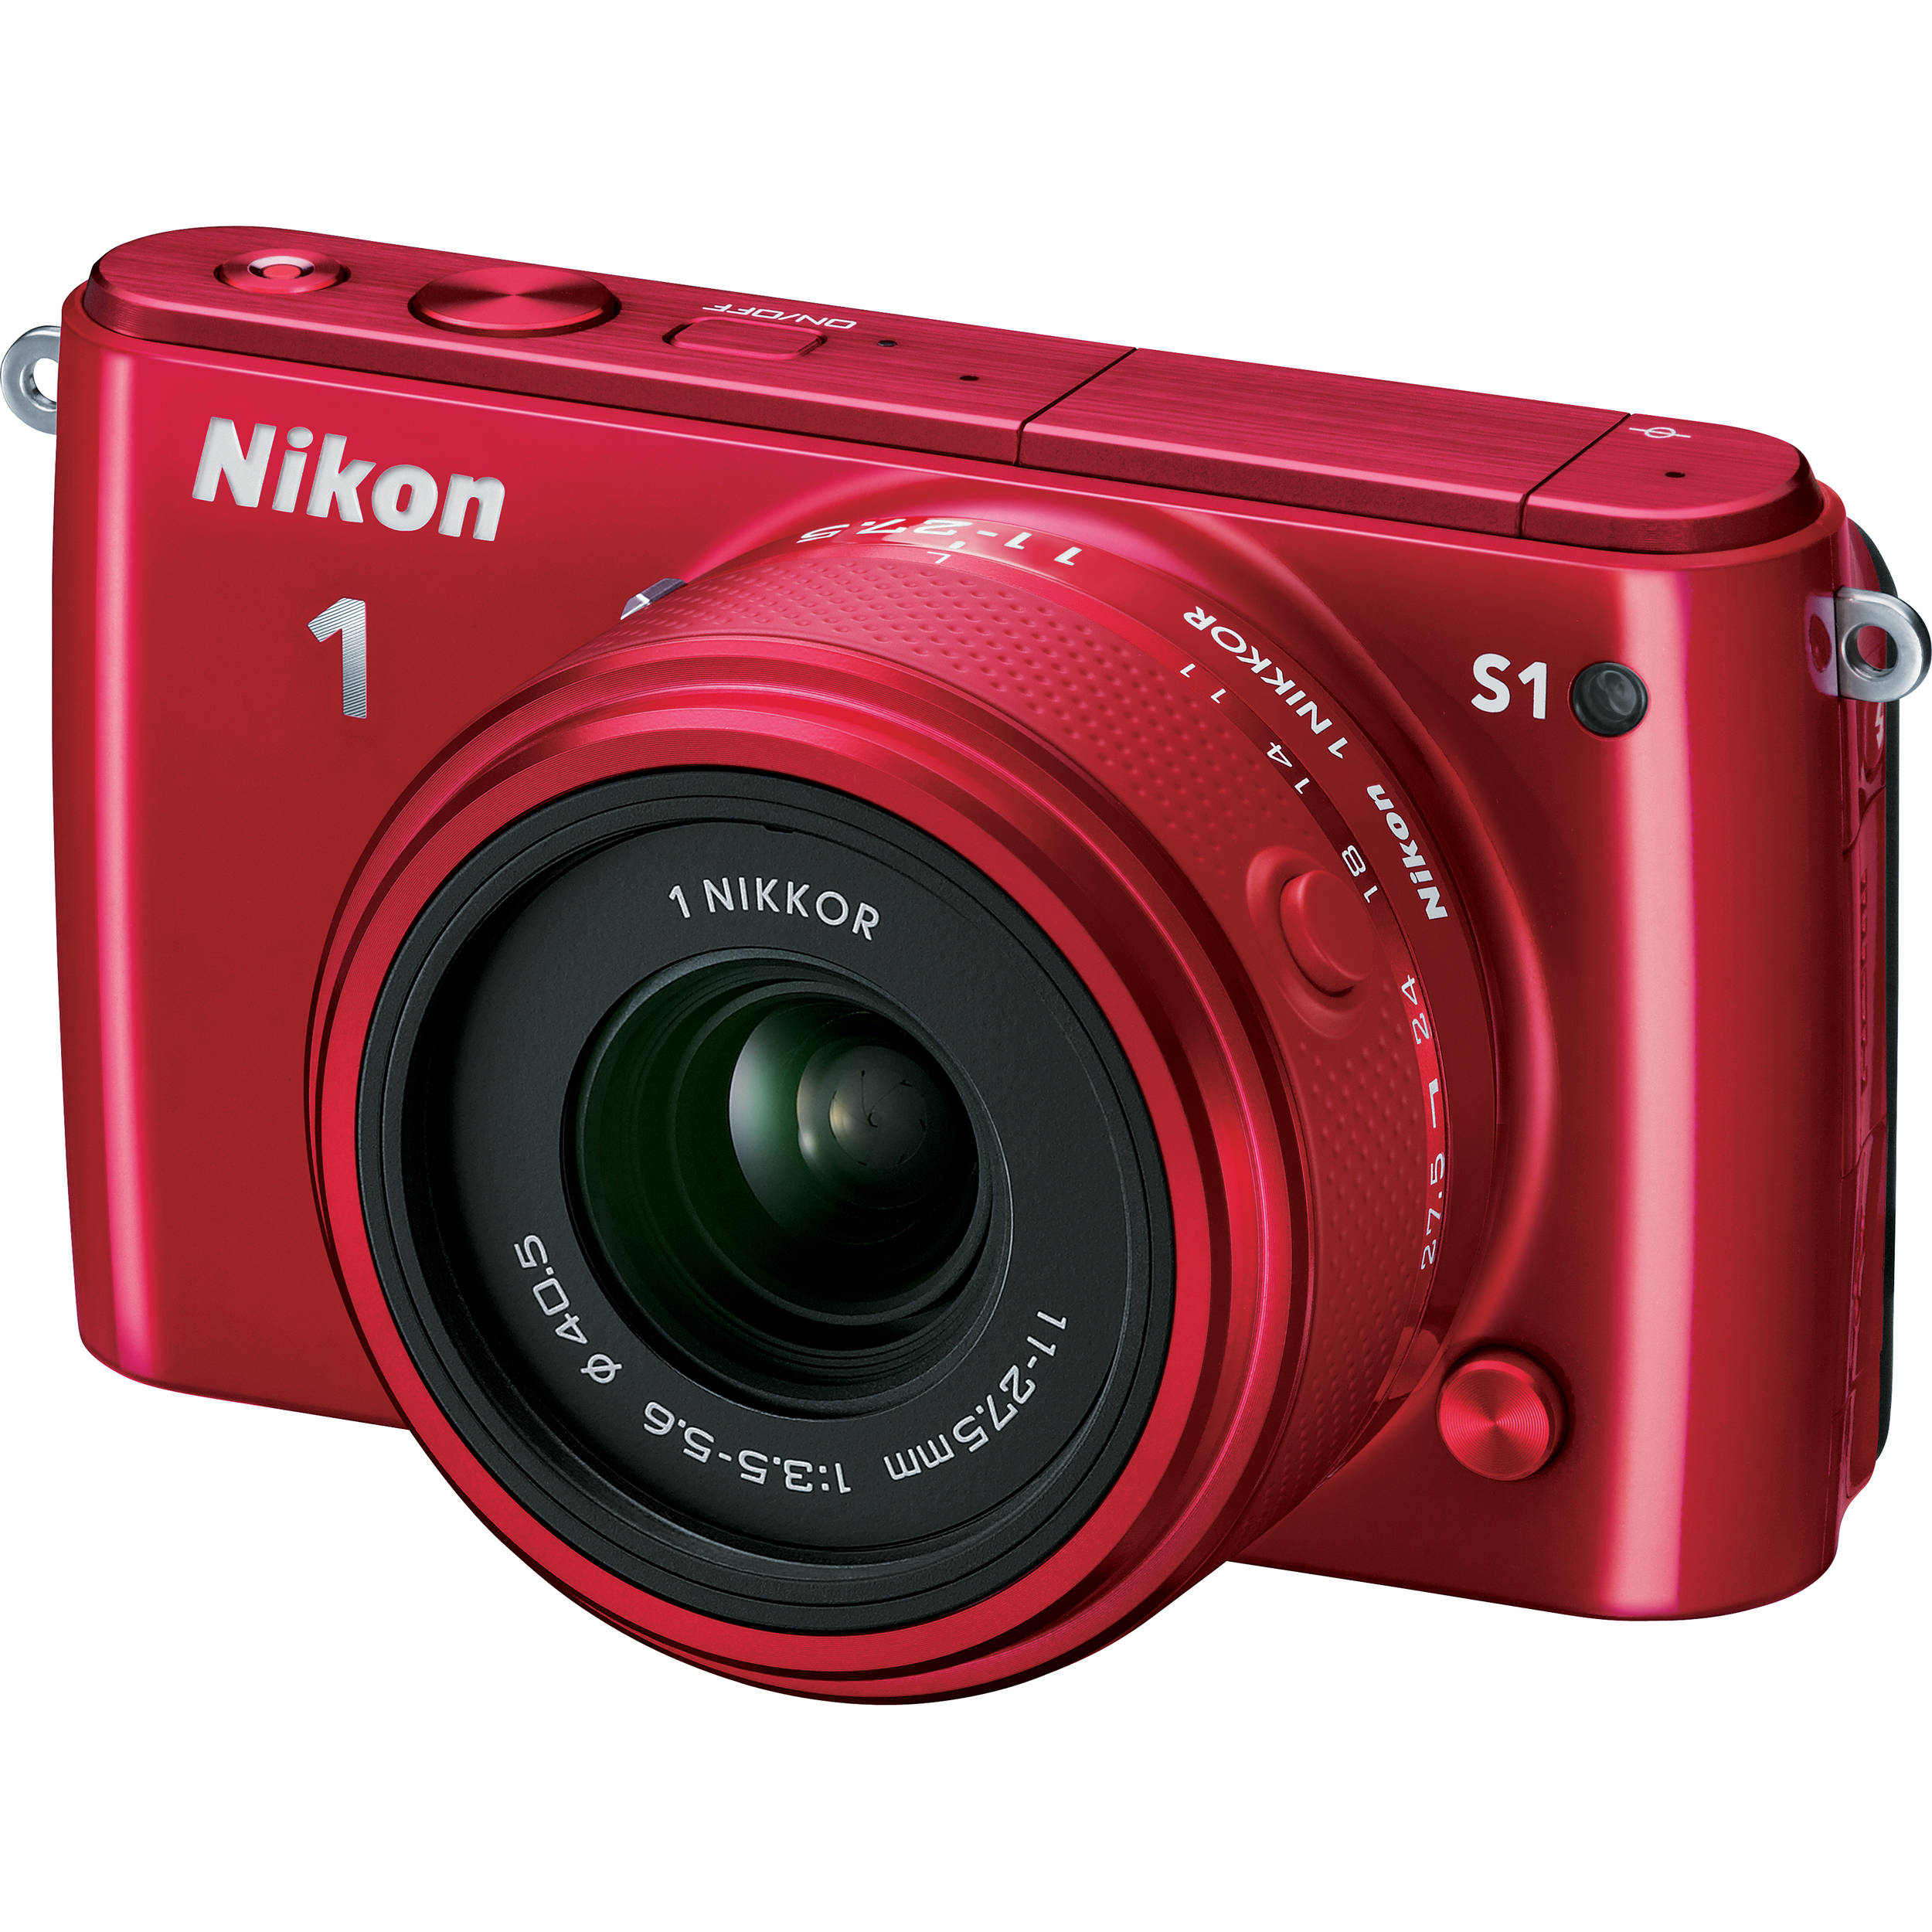 Nikon 1 S1 Mirrorless Digital Camera With 11 275mm Lens 27619 Click Image For Larger Versionnameimg1634jpgviews268size638 Kbid Red